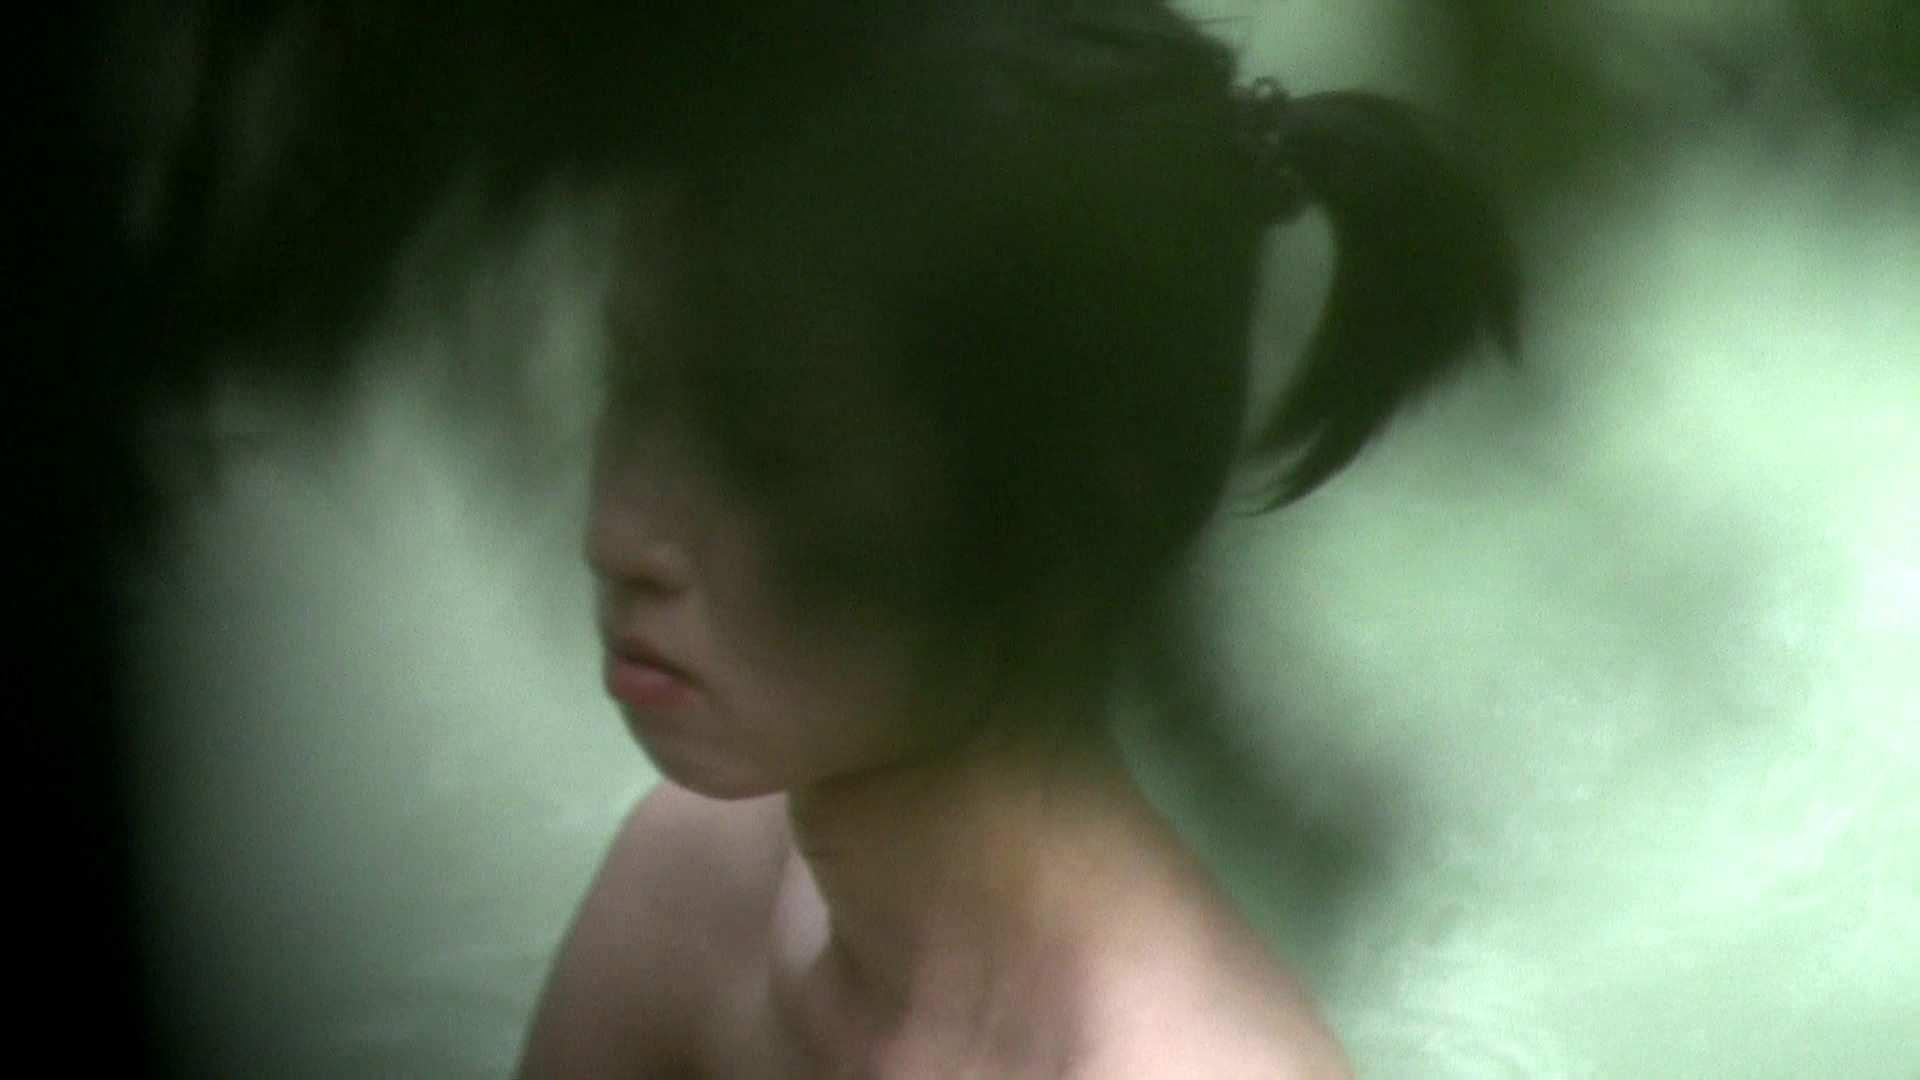 Aquaな露天風呂Vol.656 OLセックス   露天  72画像 70